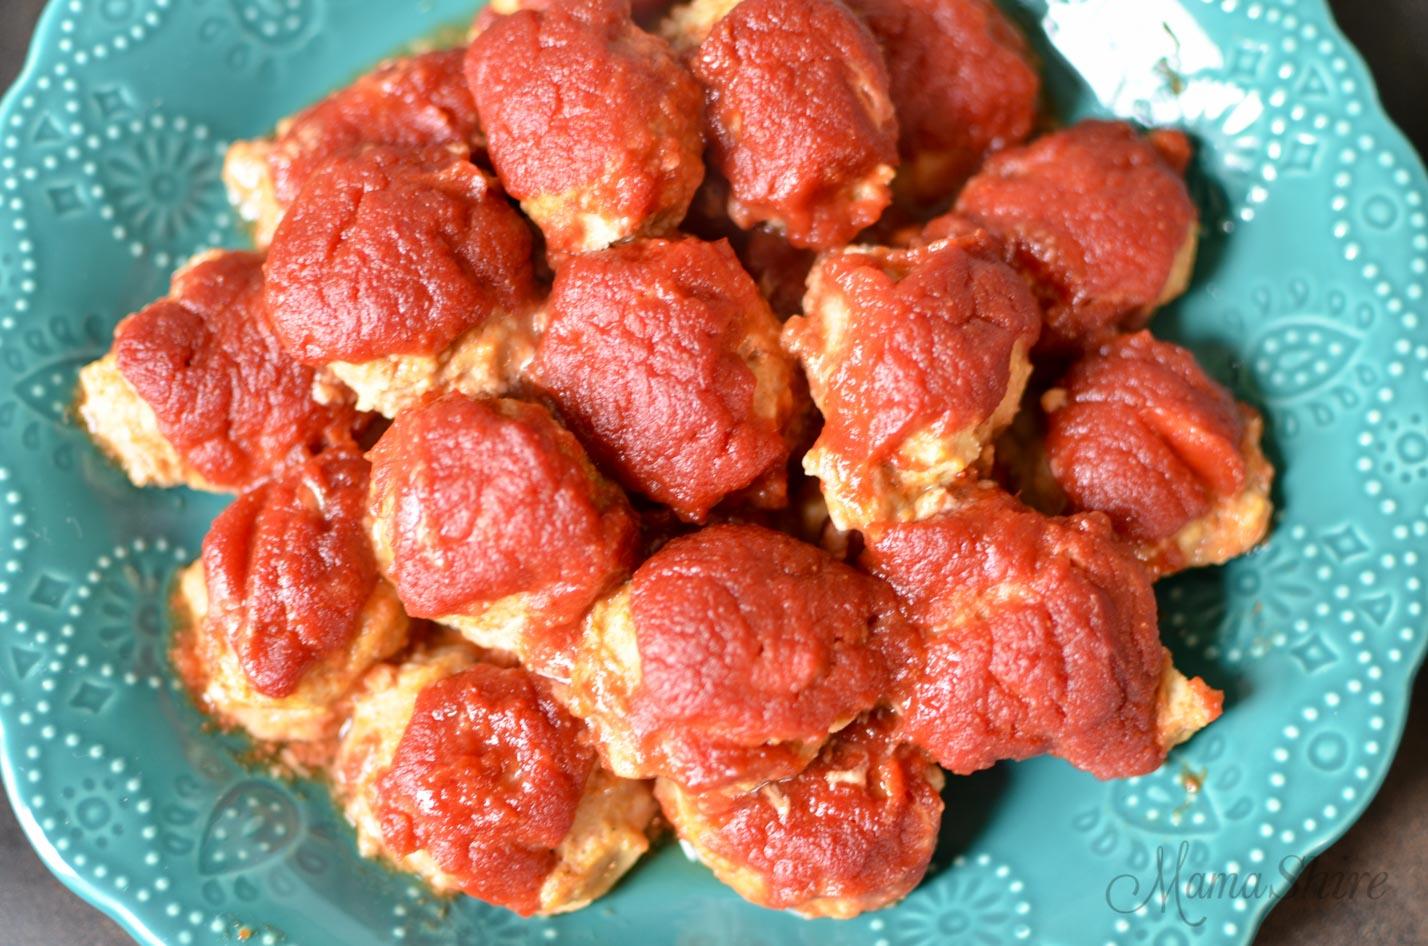 Turkey Barbecue Meatballs (Gluten-Free, Dairy-Free, Sugar-Free) - THM-S - MamaShire.com